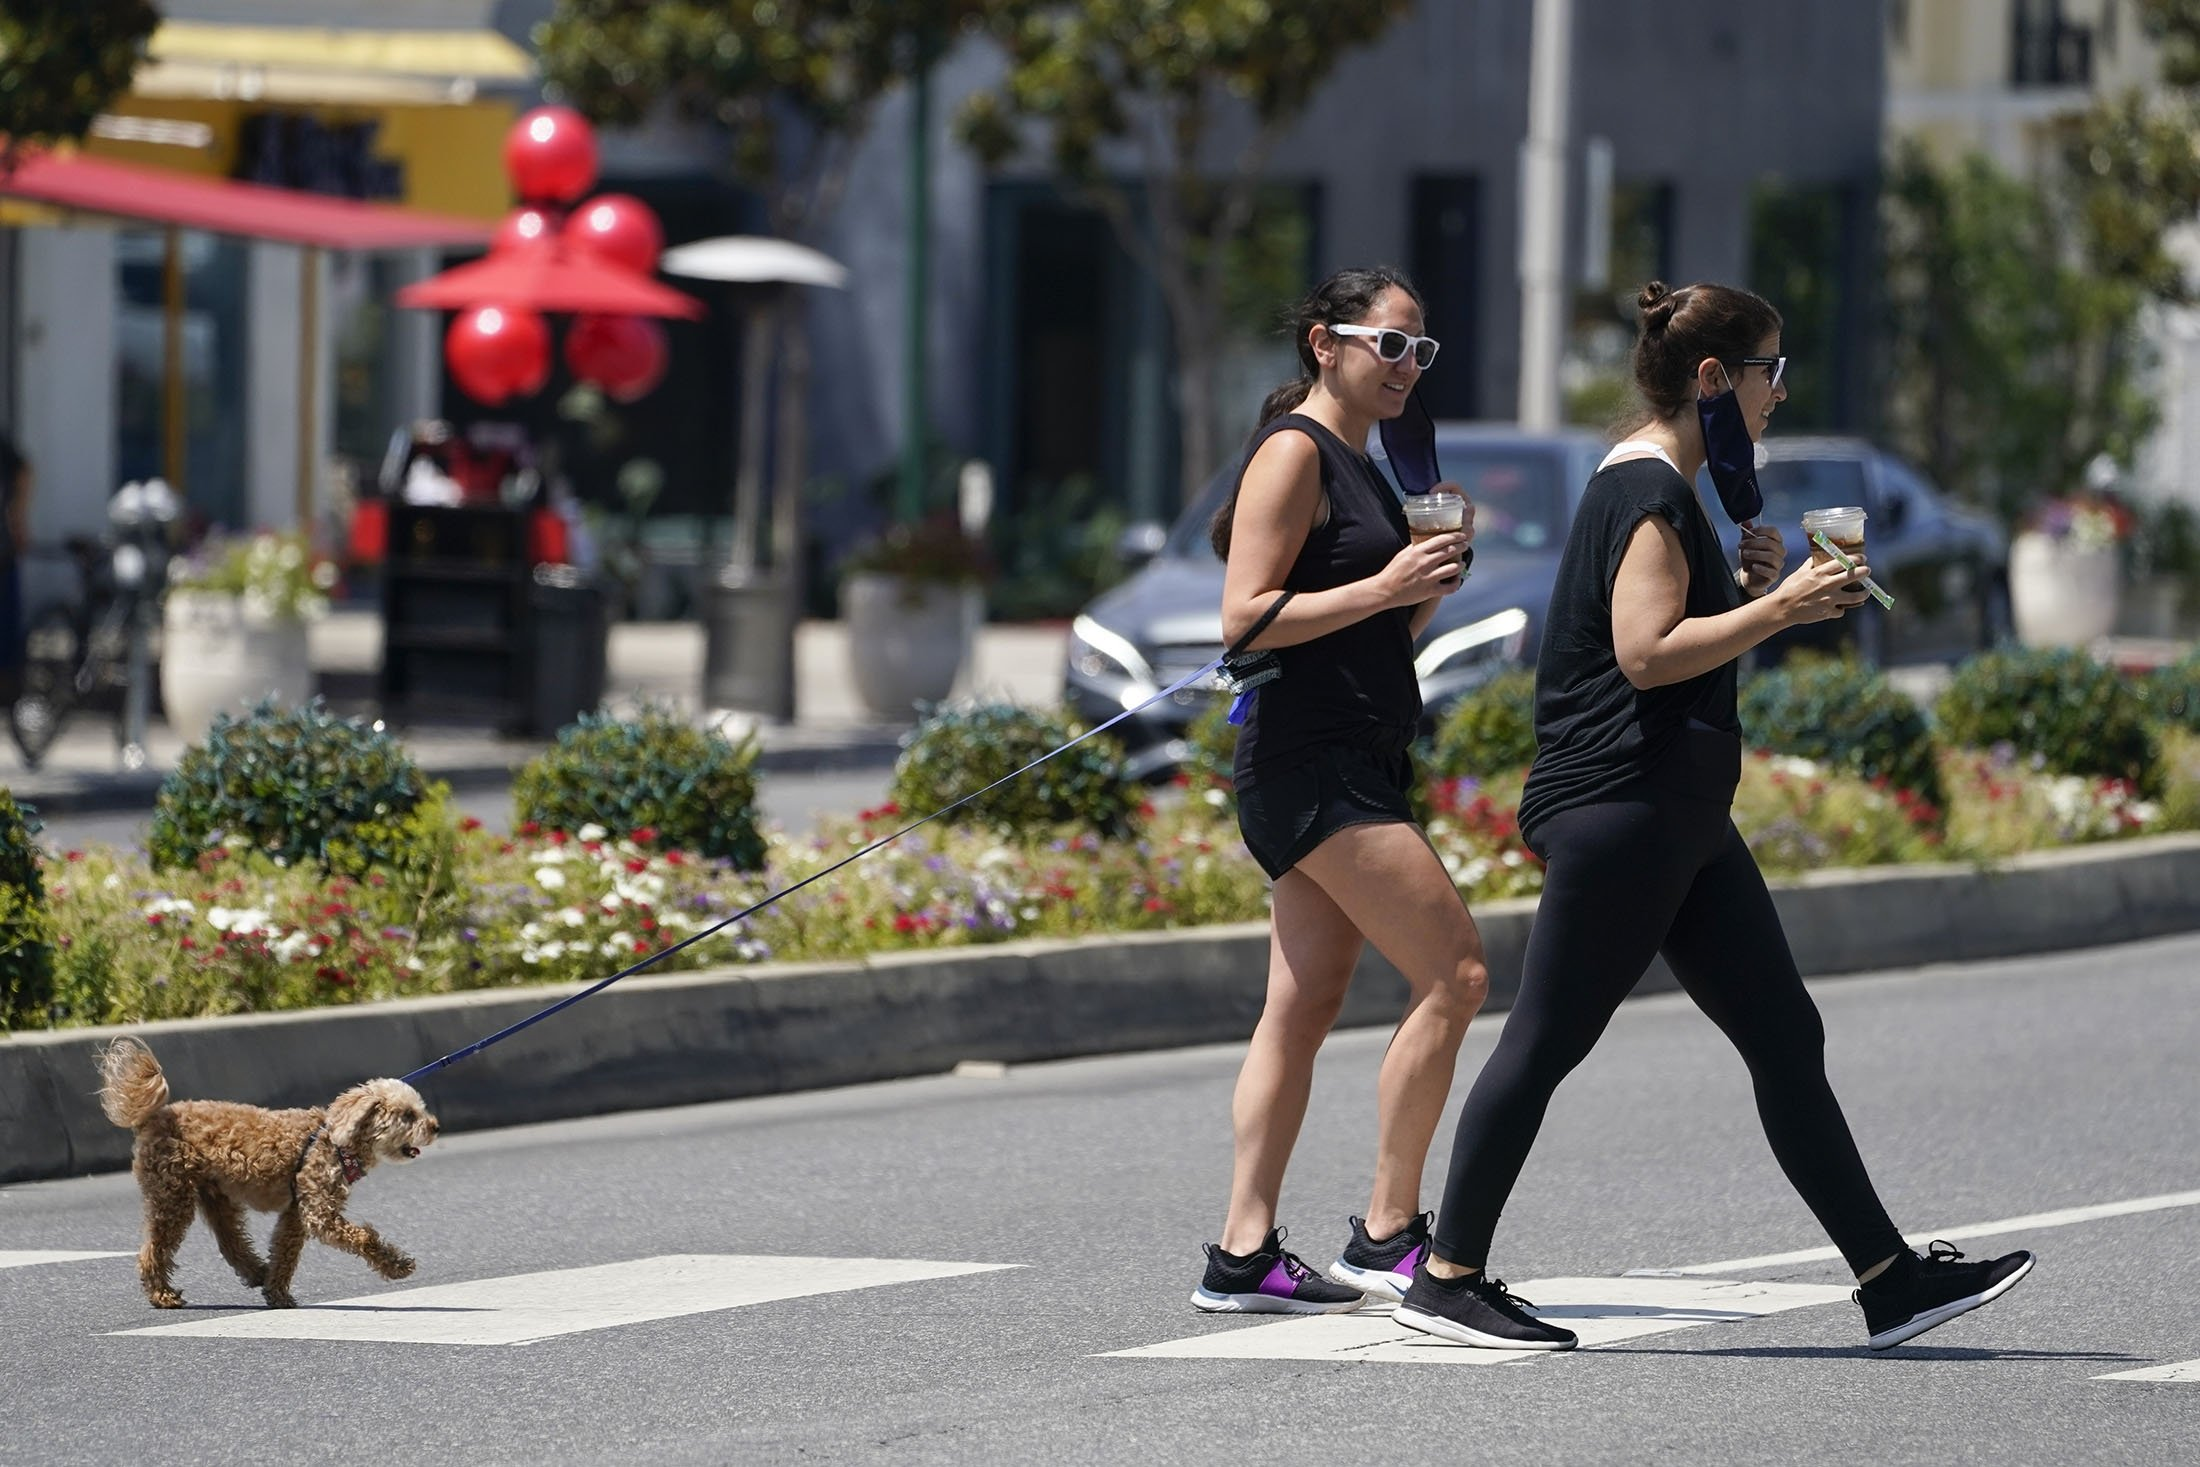 Stacy Shapiro and Sarah Shapiro put on masks while walking their dog, Boker, on Sunset Blvd, West Hollywood, California, U.S., July 2, 2020. (AP Photo)